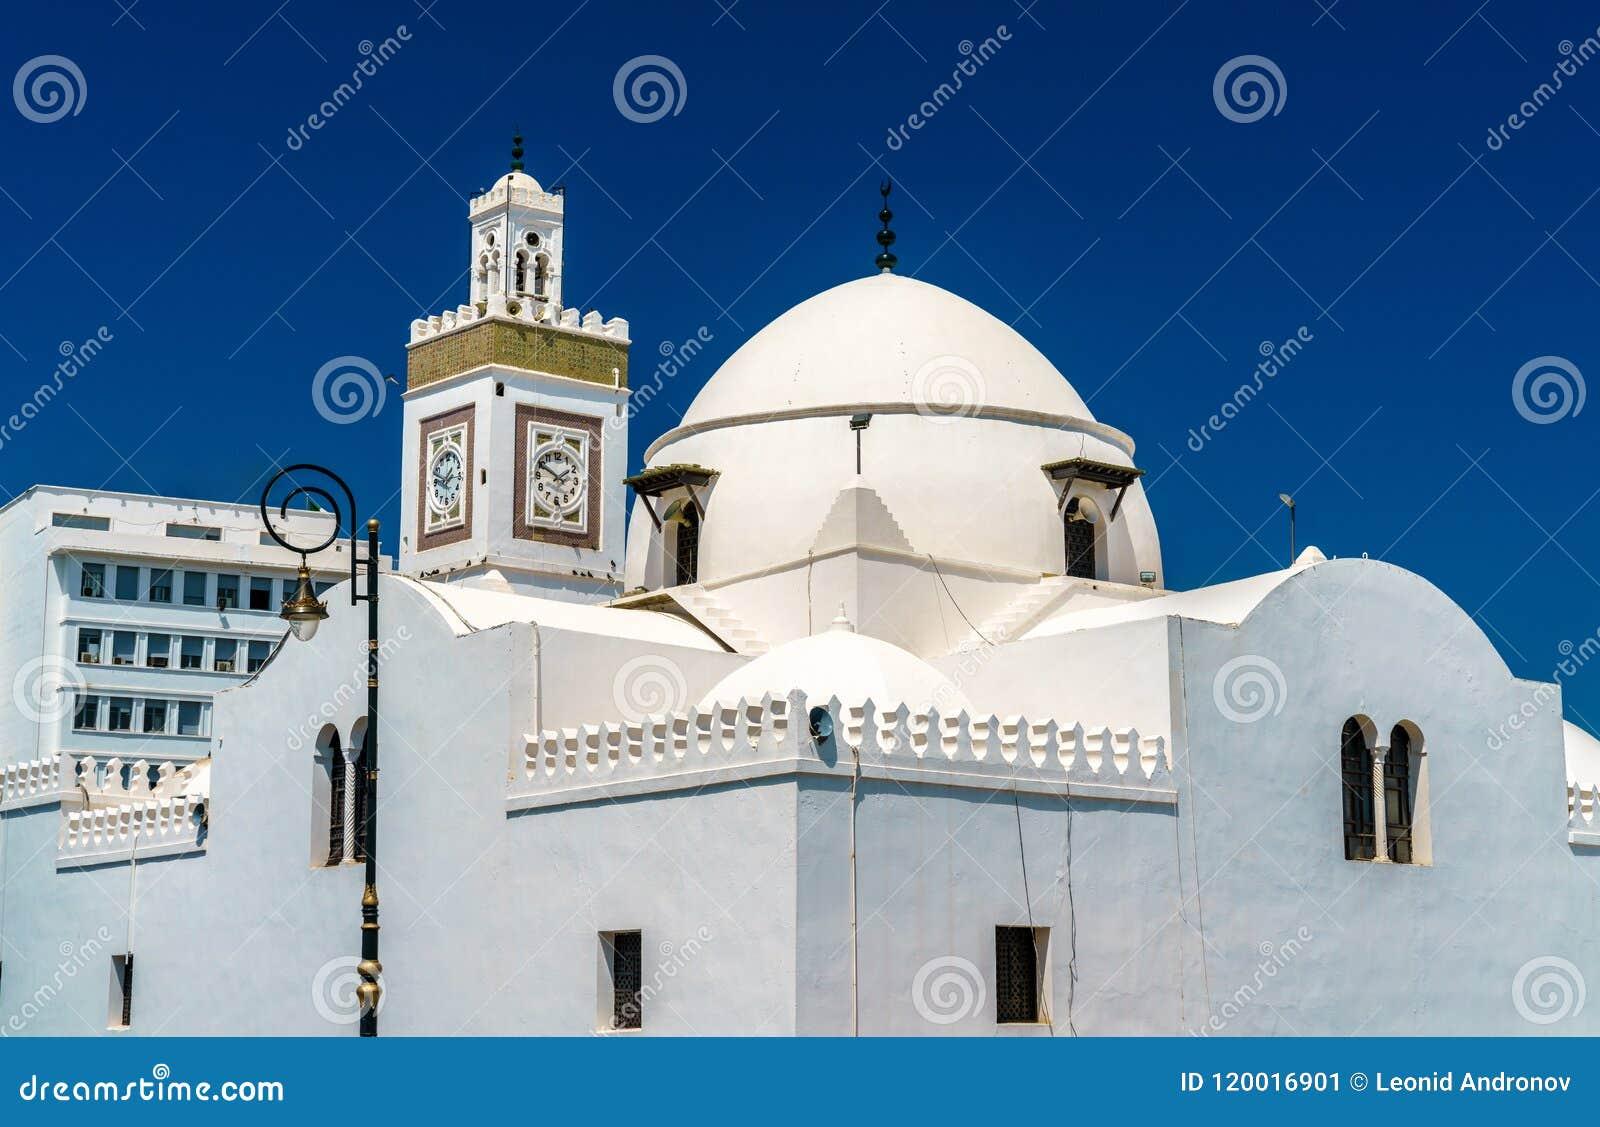 Djamaa al-Djedid mosque in Algiers, Algeria